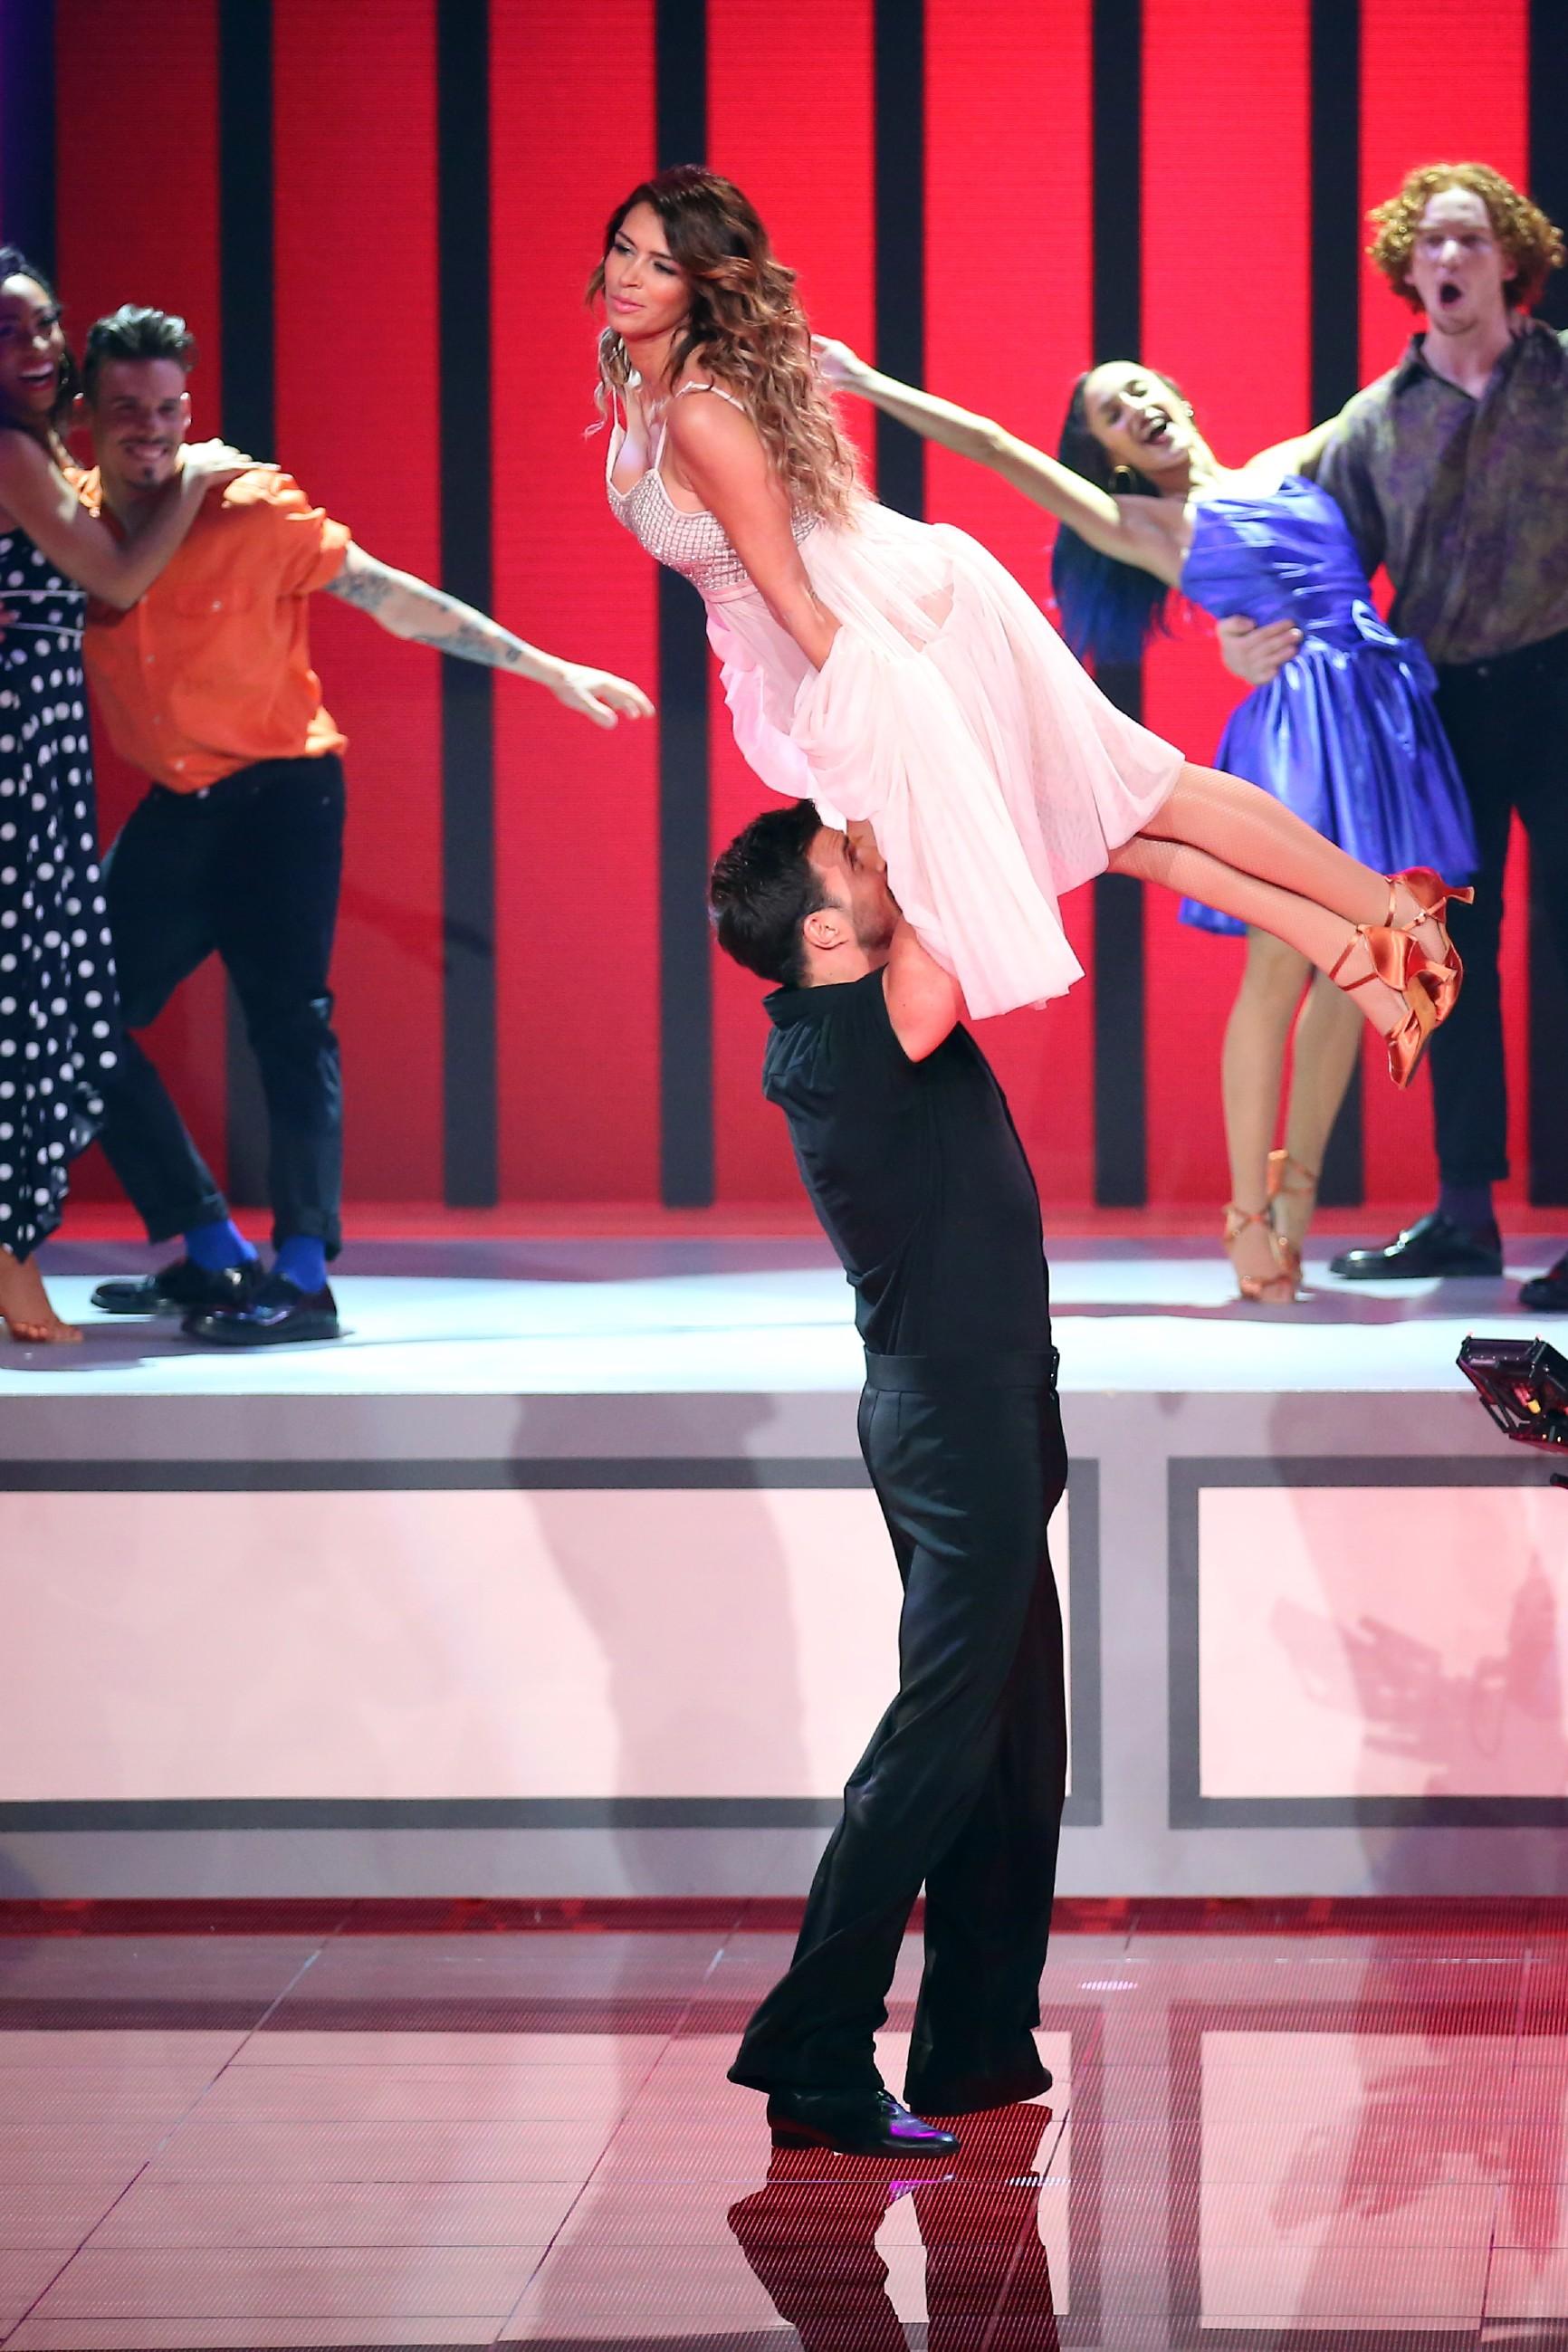 Dance dance dance stars on tv for Spiegel tv heute abend thema